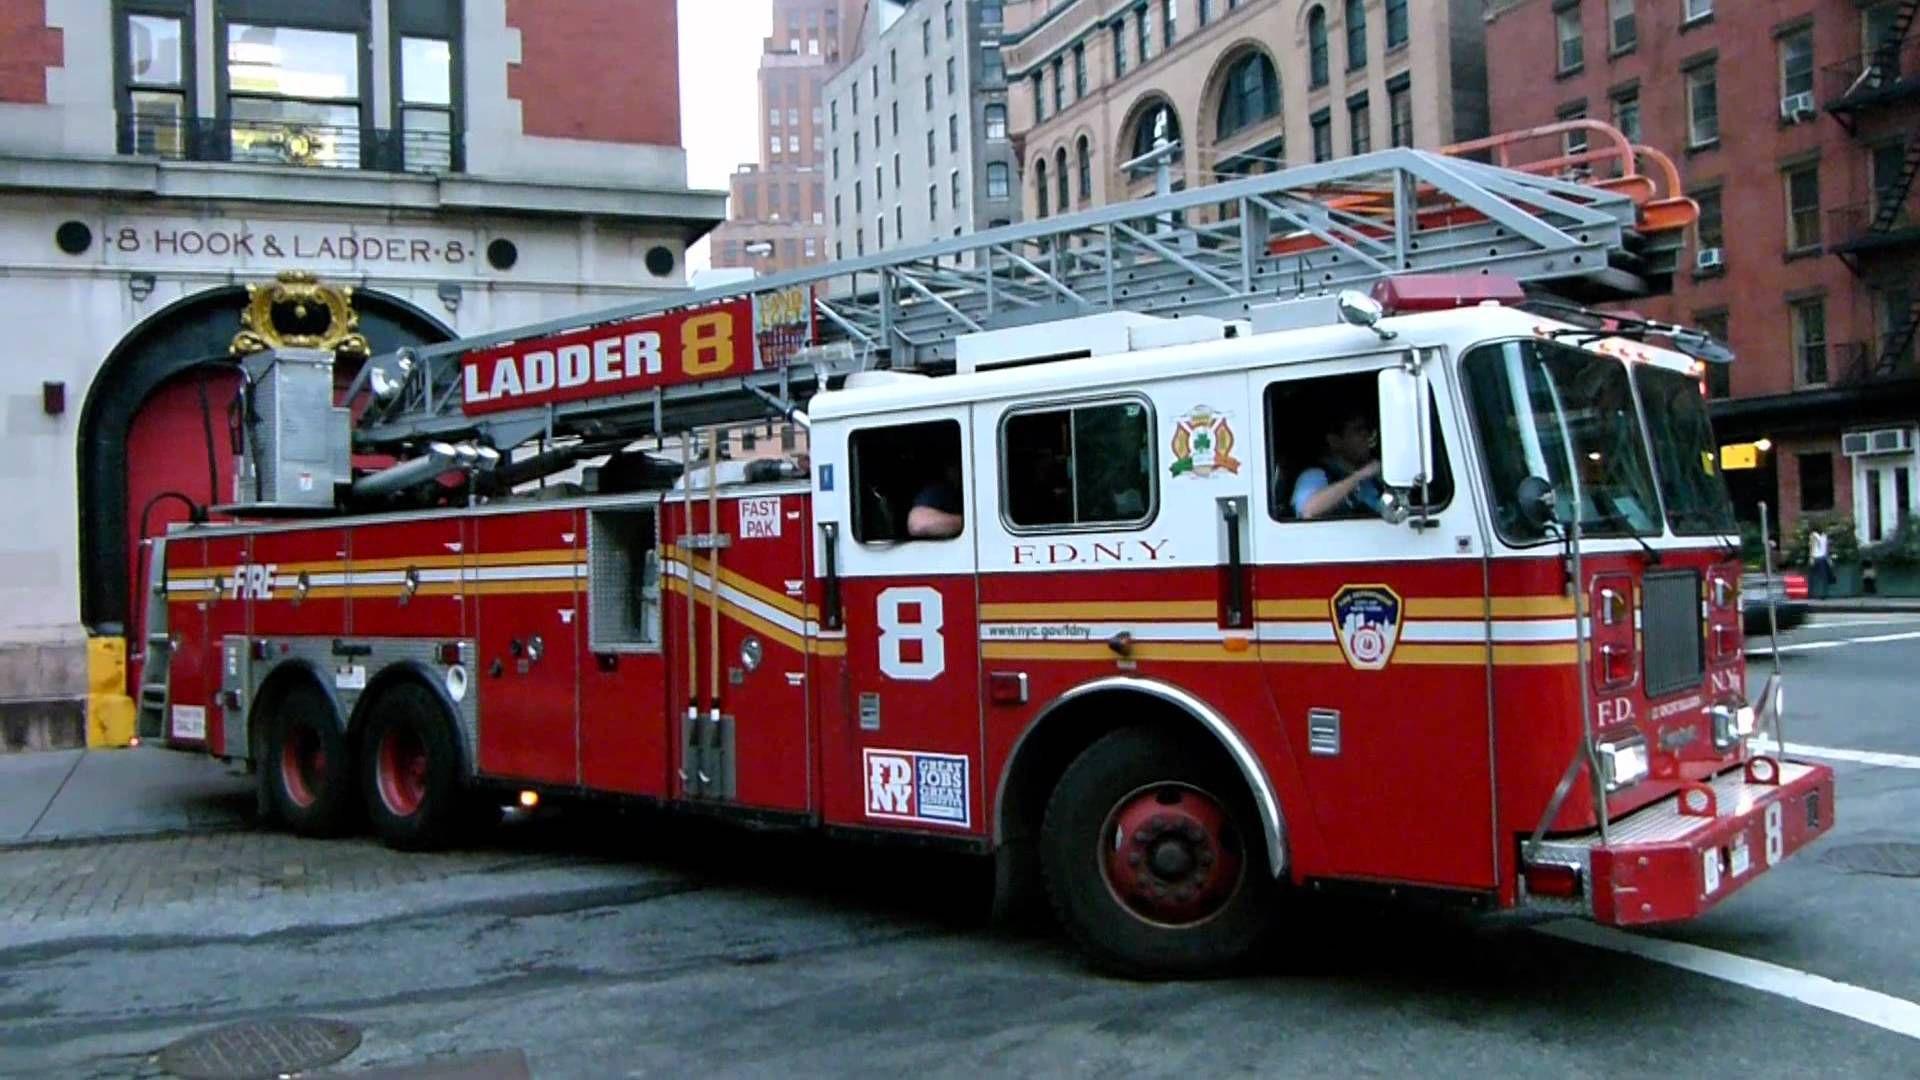 Fire Trucks In Action Bing Images Fire Trucks Fdny Trucks